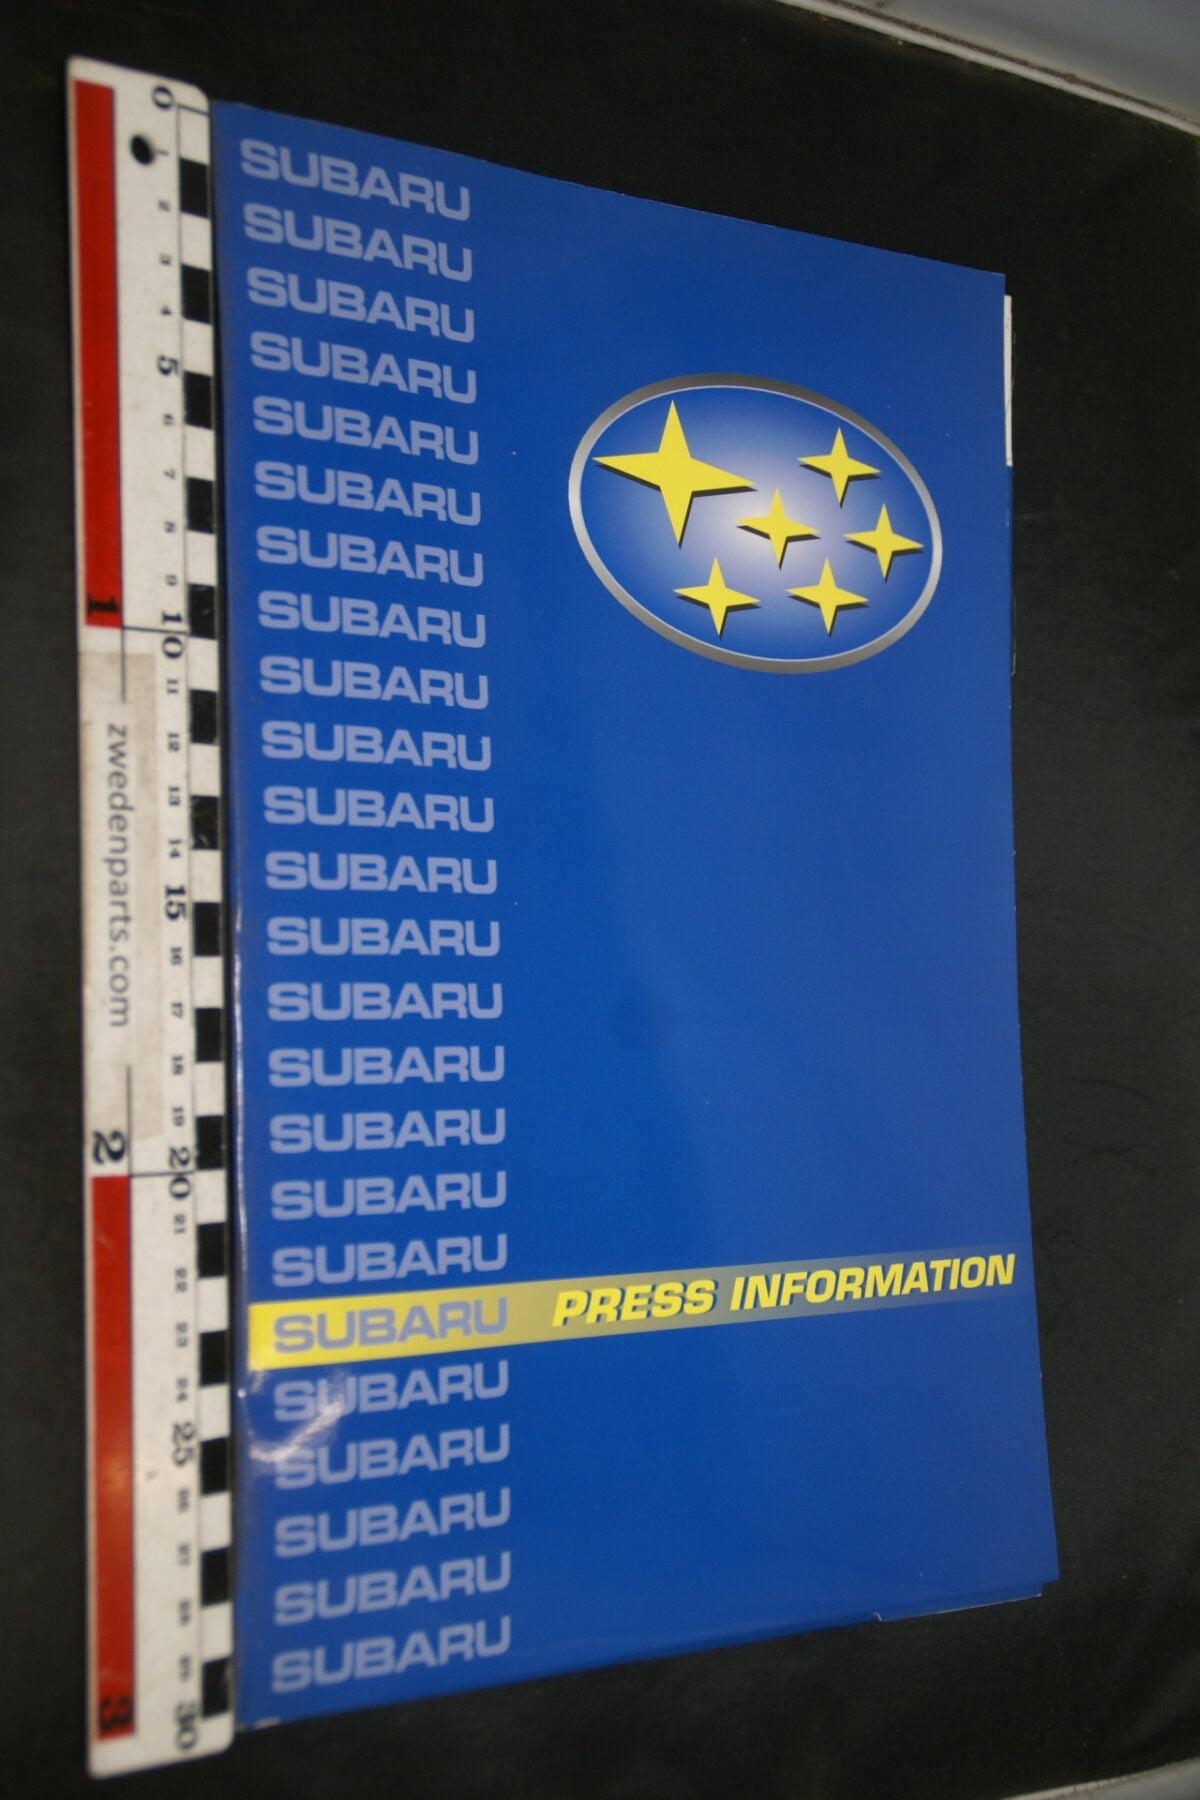 DSC02413 2001 originele persmap Subaru-9190b821